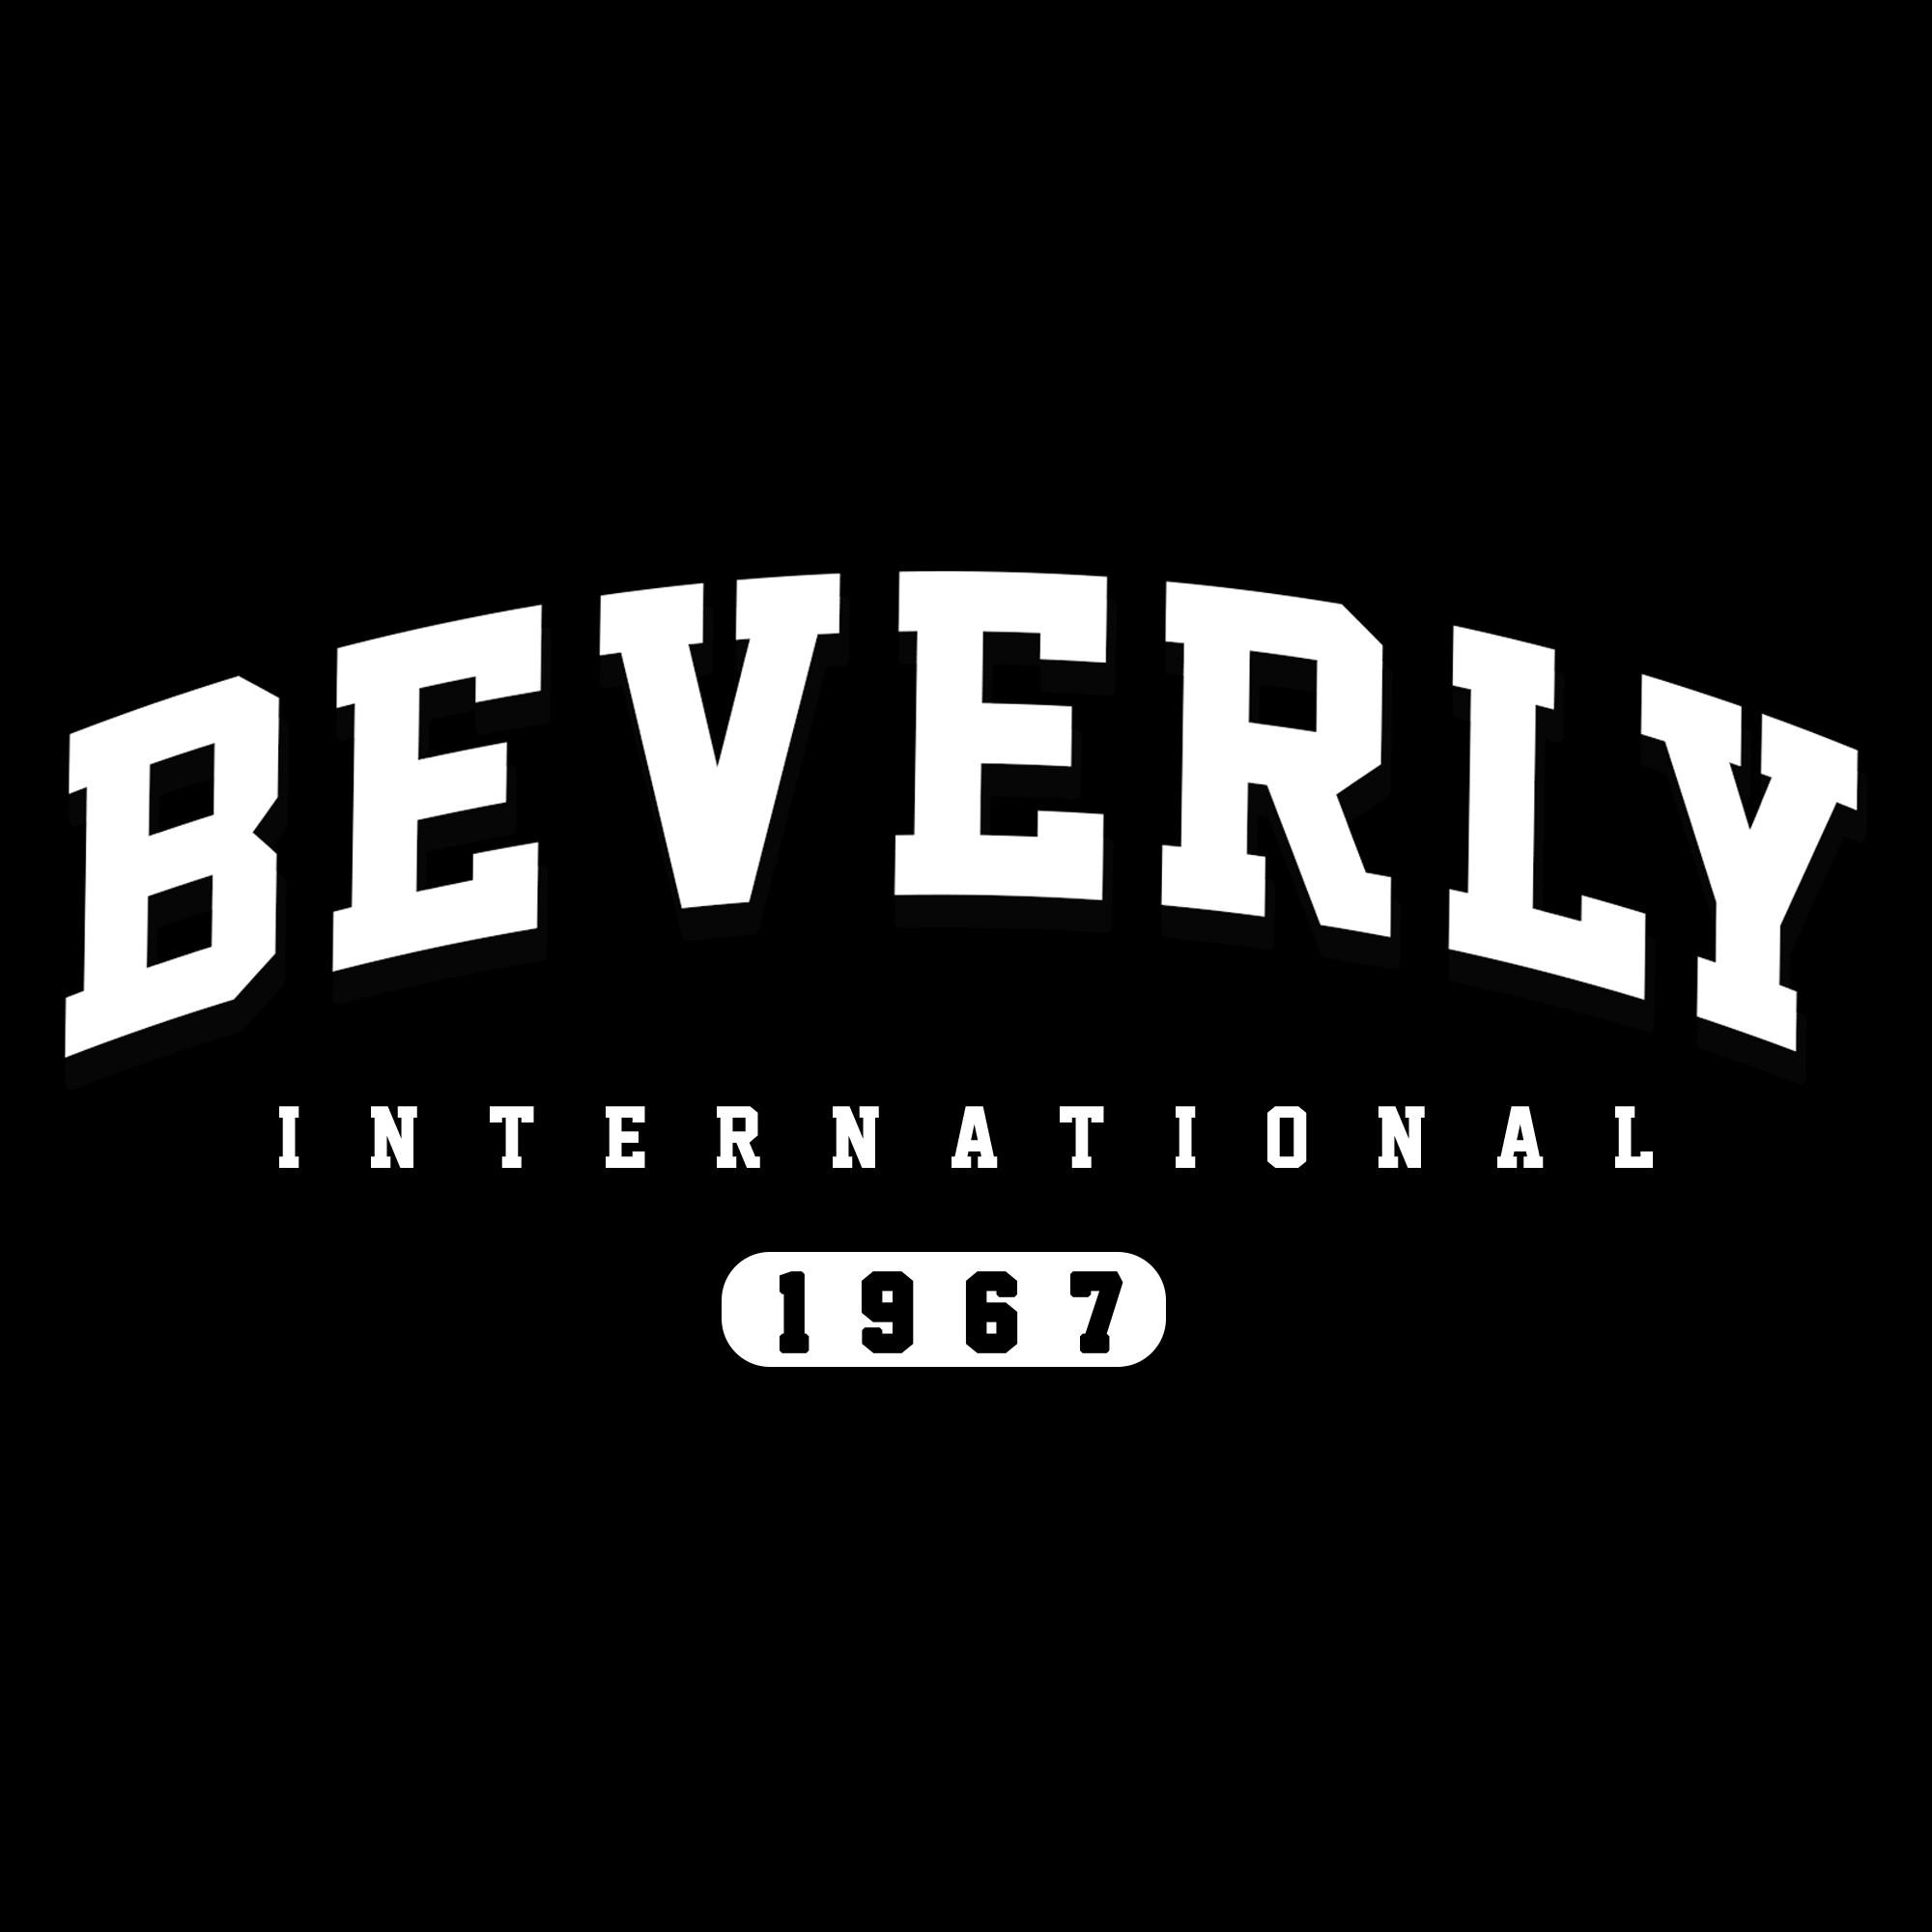 Beverly International - No Nonsense T-Shirt